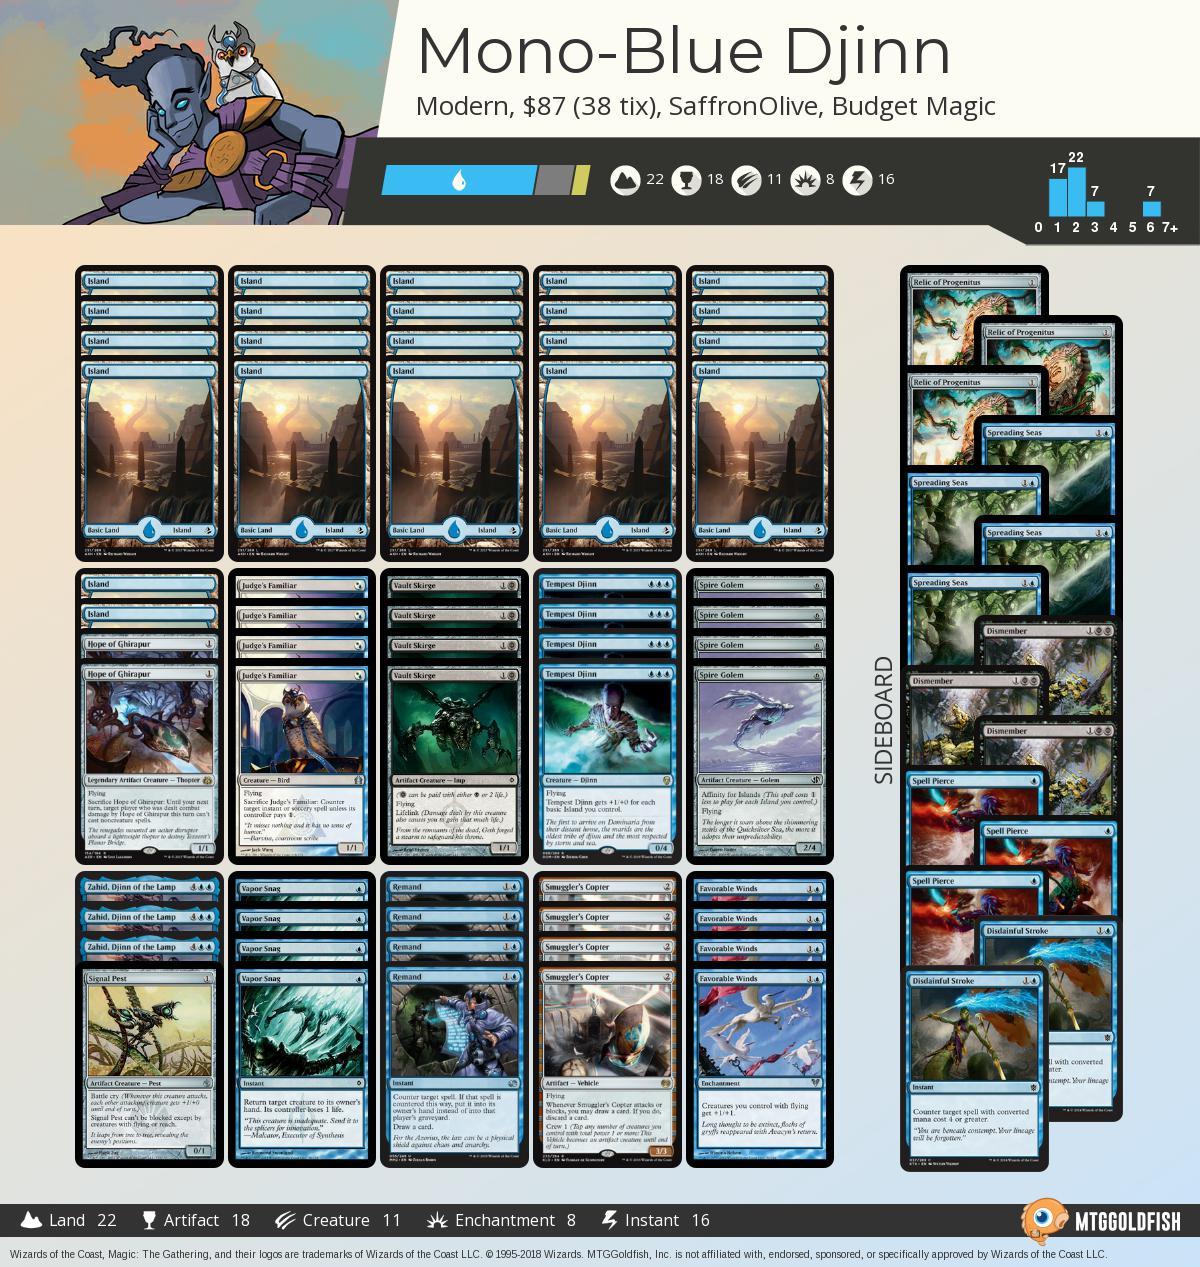 Mono blue%2bdjinn 37430b9d 7486 4ec1 b841 9cfc760092a0%2ejpg